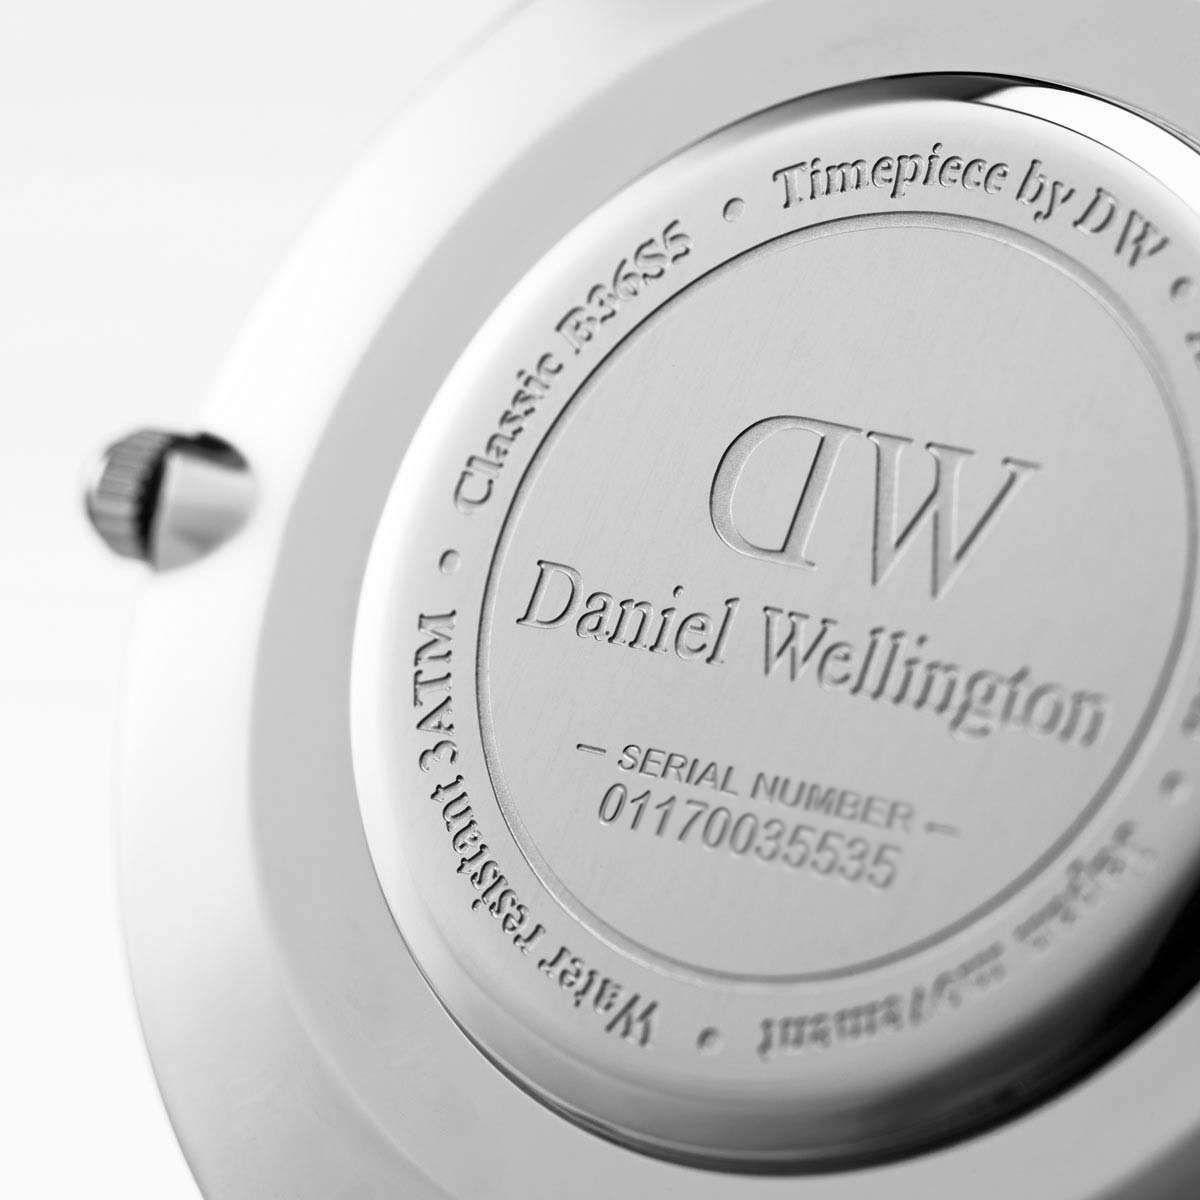 dw官网 dw手表官网 dw中国官网 dw官方旗舰店 DW DW官网  W Classic Black Cornwall Silver 36mm